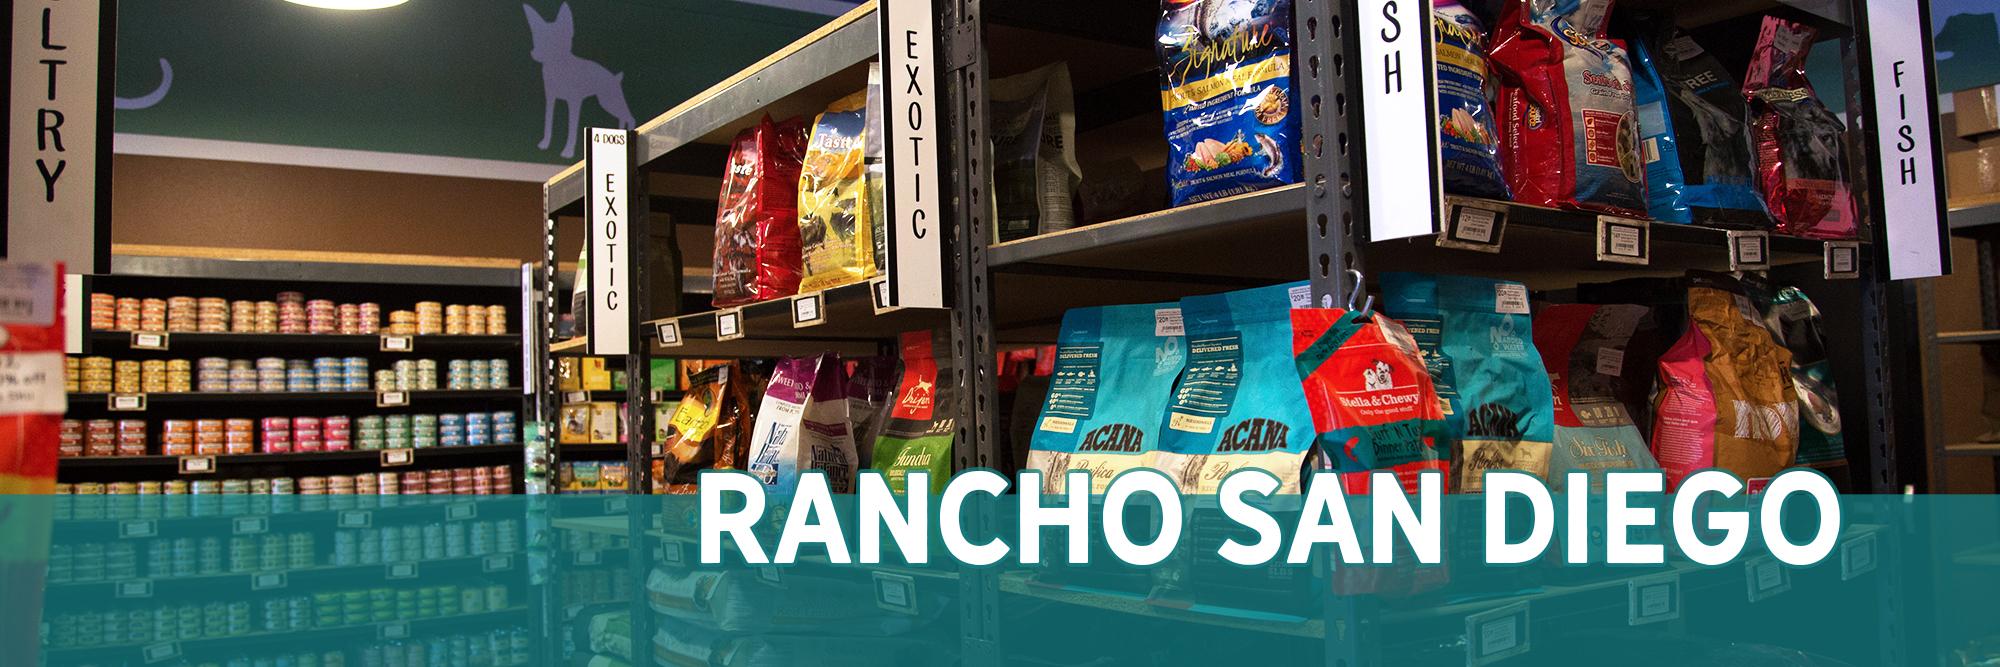 Natural Pet Food in Rancho San Diego